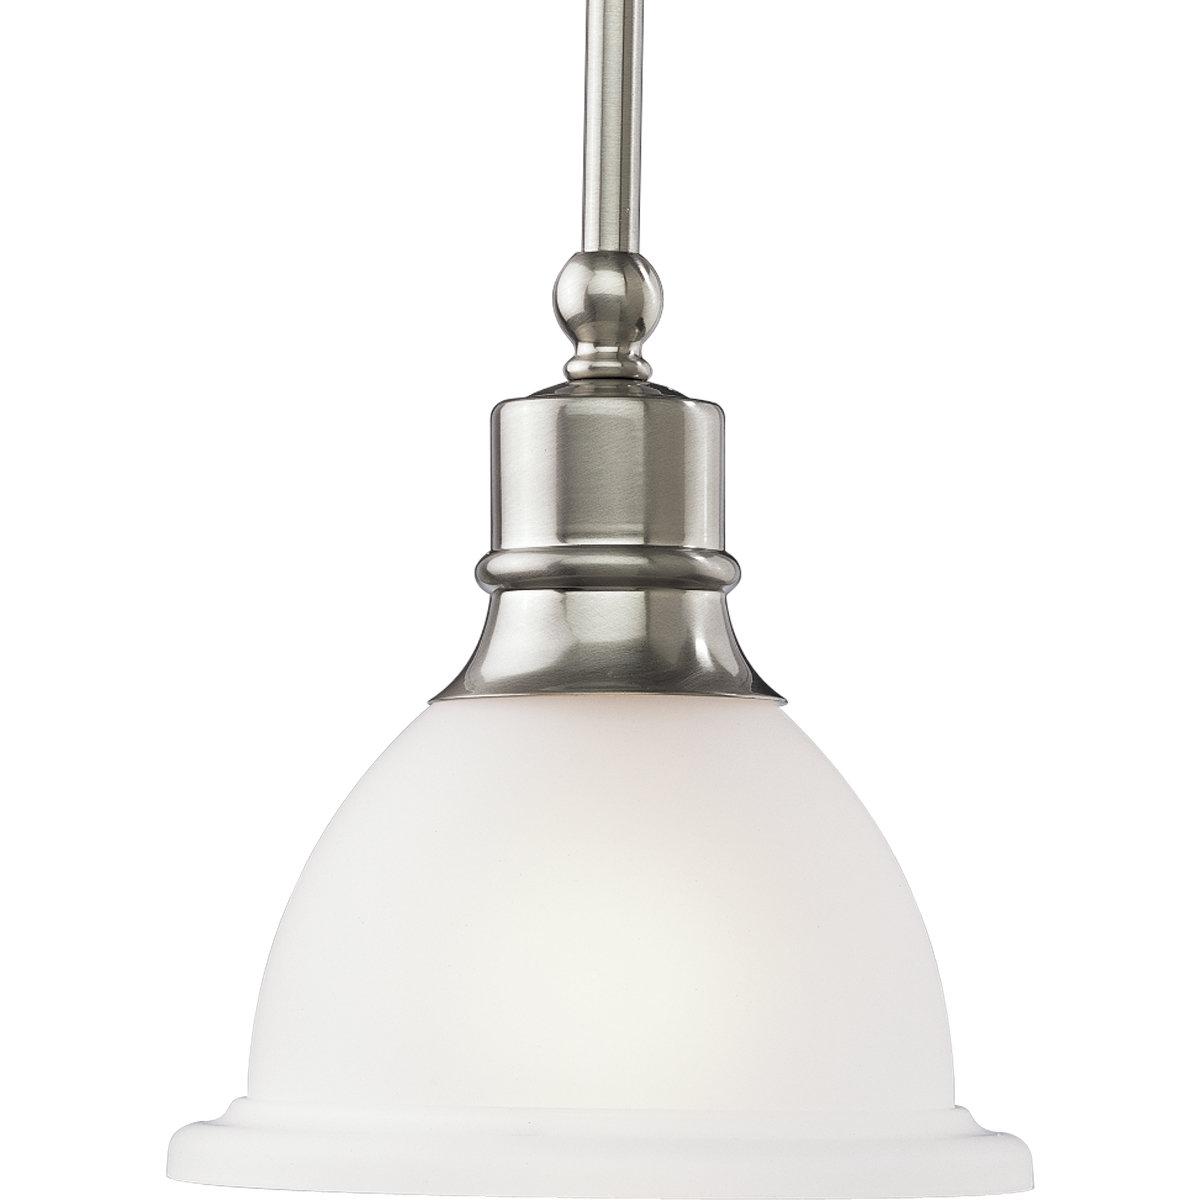 Vangorder 1 Light Single Bell Pendant Within Most Recent Macon 1 Light Single Dome Pendants (View 22 of 25)